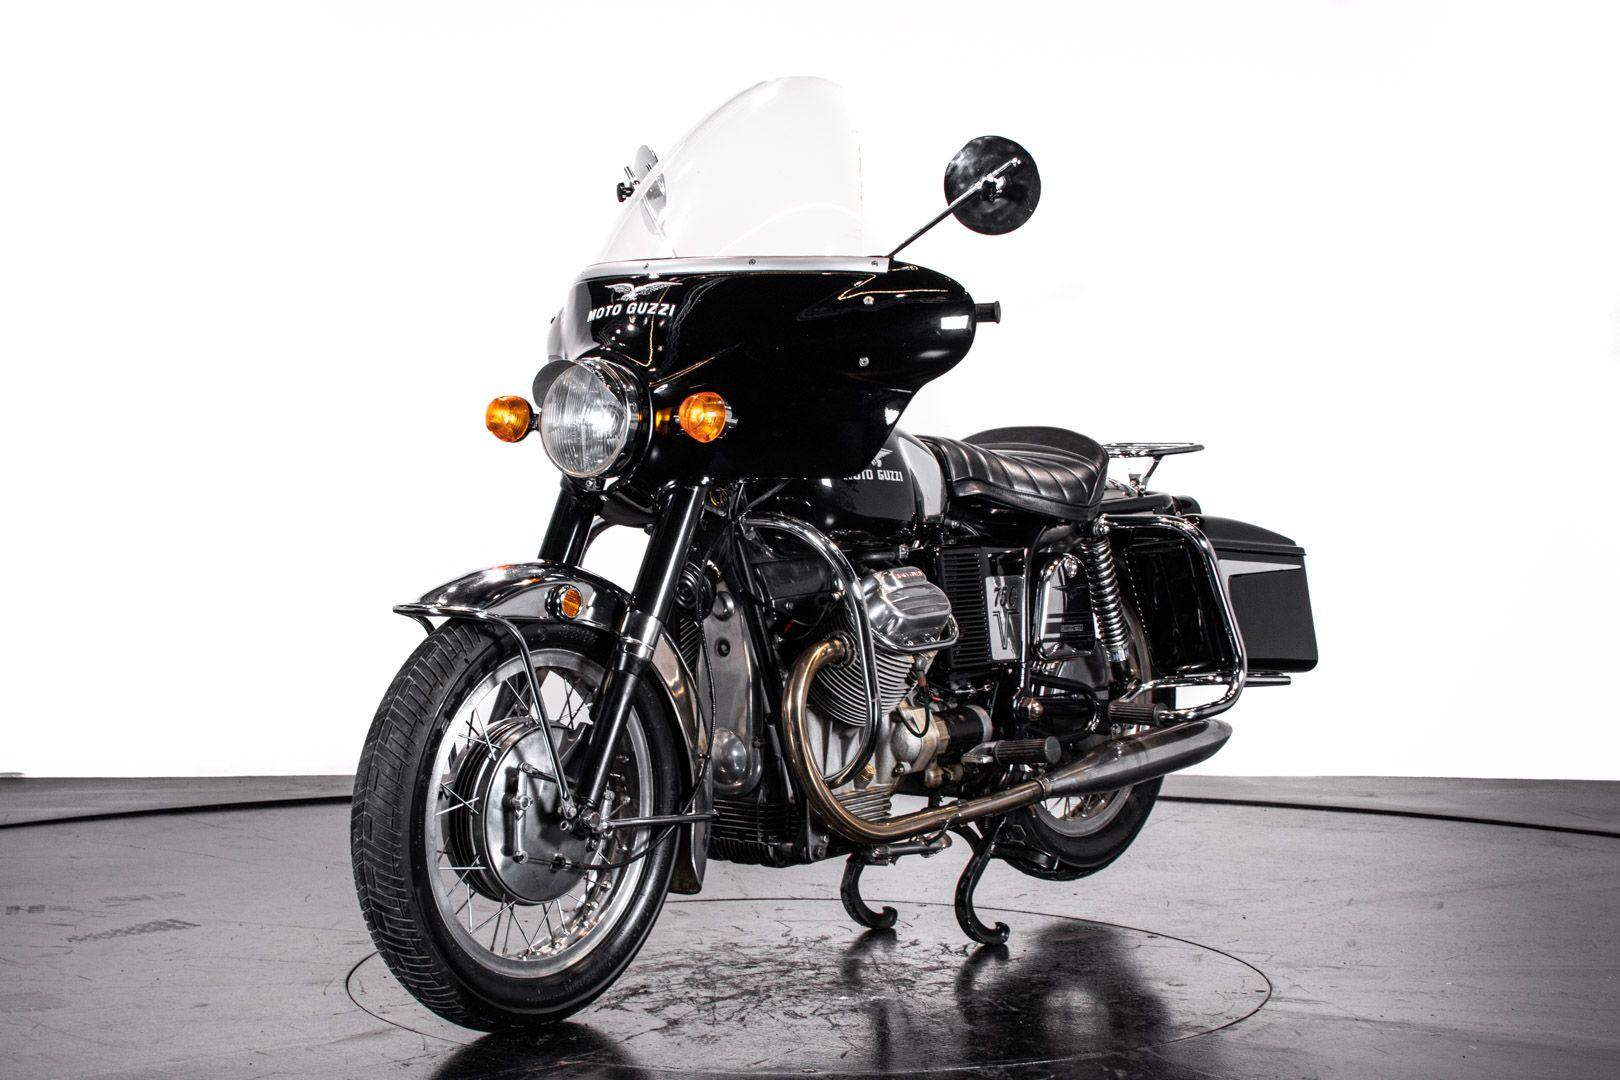 1969 Moto Guzzi V7 Special 81471